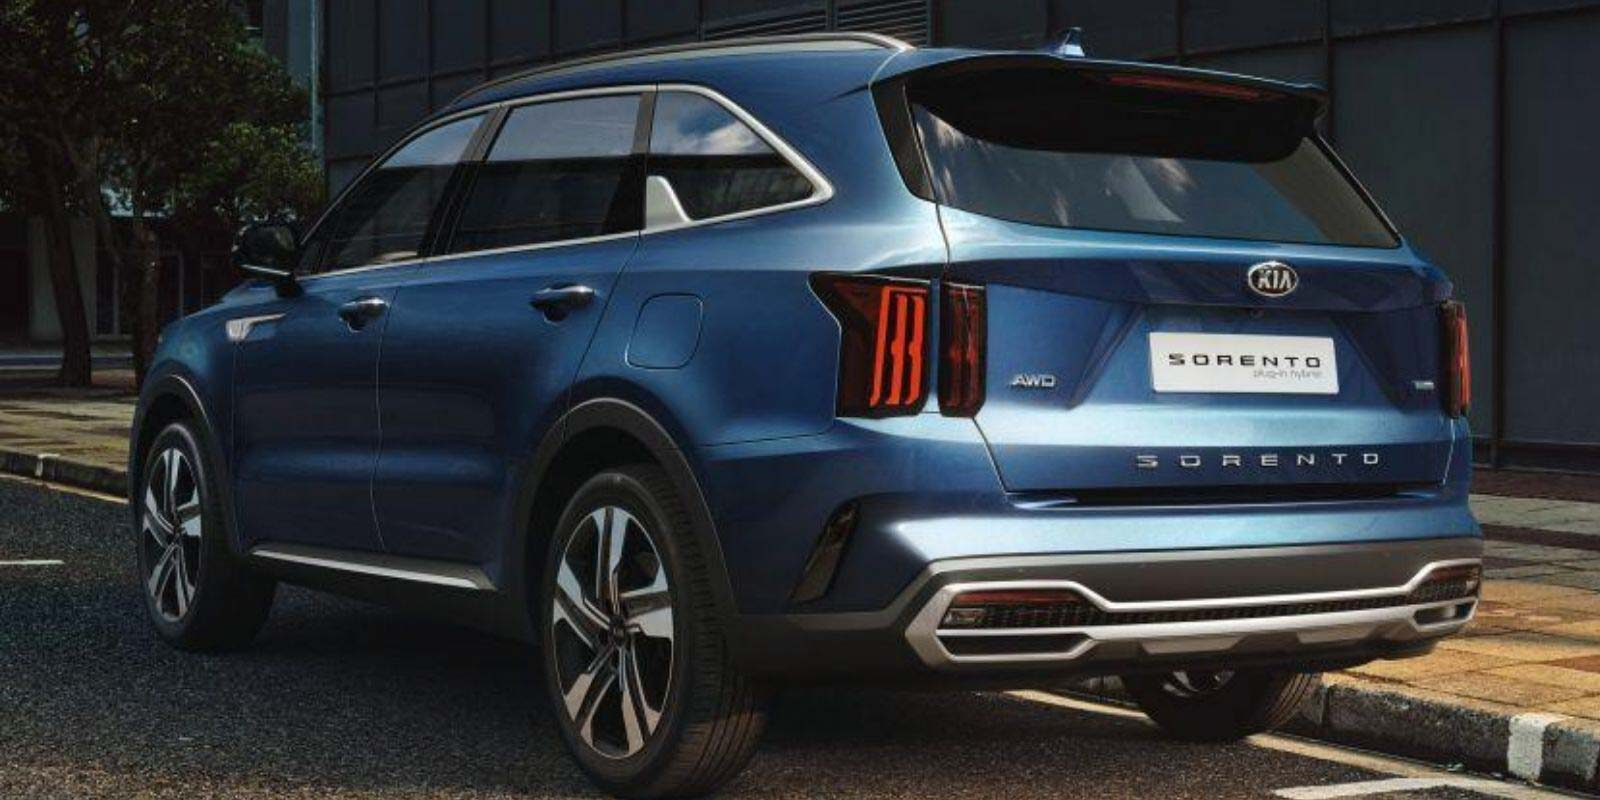 2021 Kia Sorento Plug-In Hybrid SUV Unveiled With 4WD System